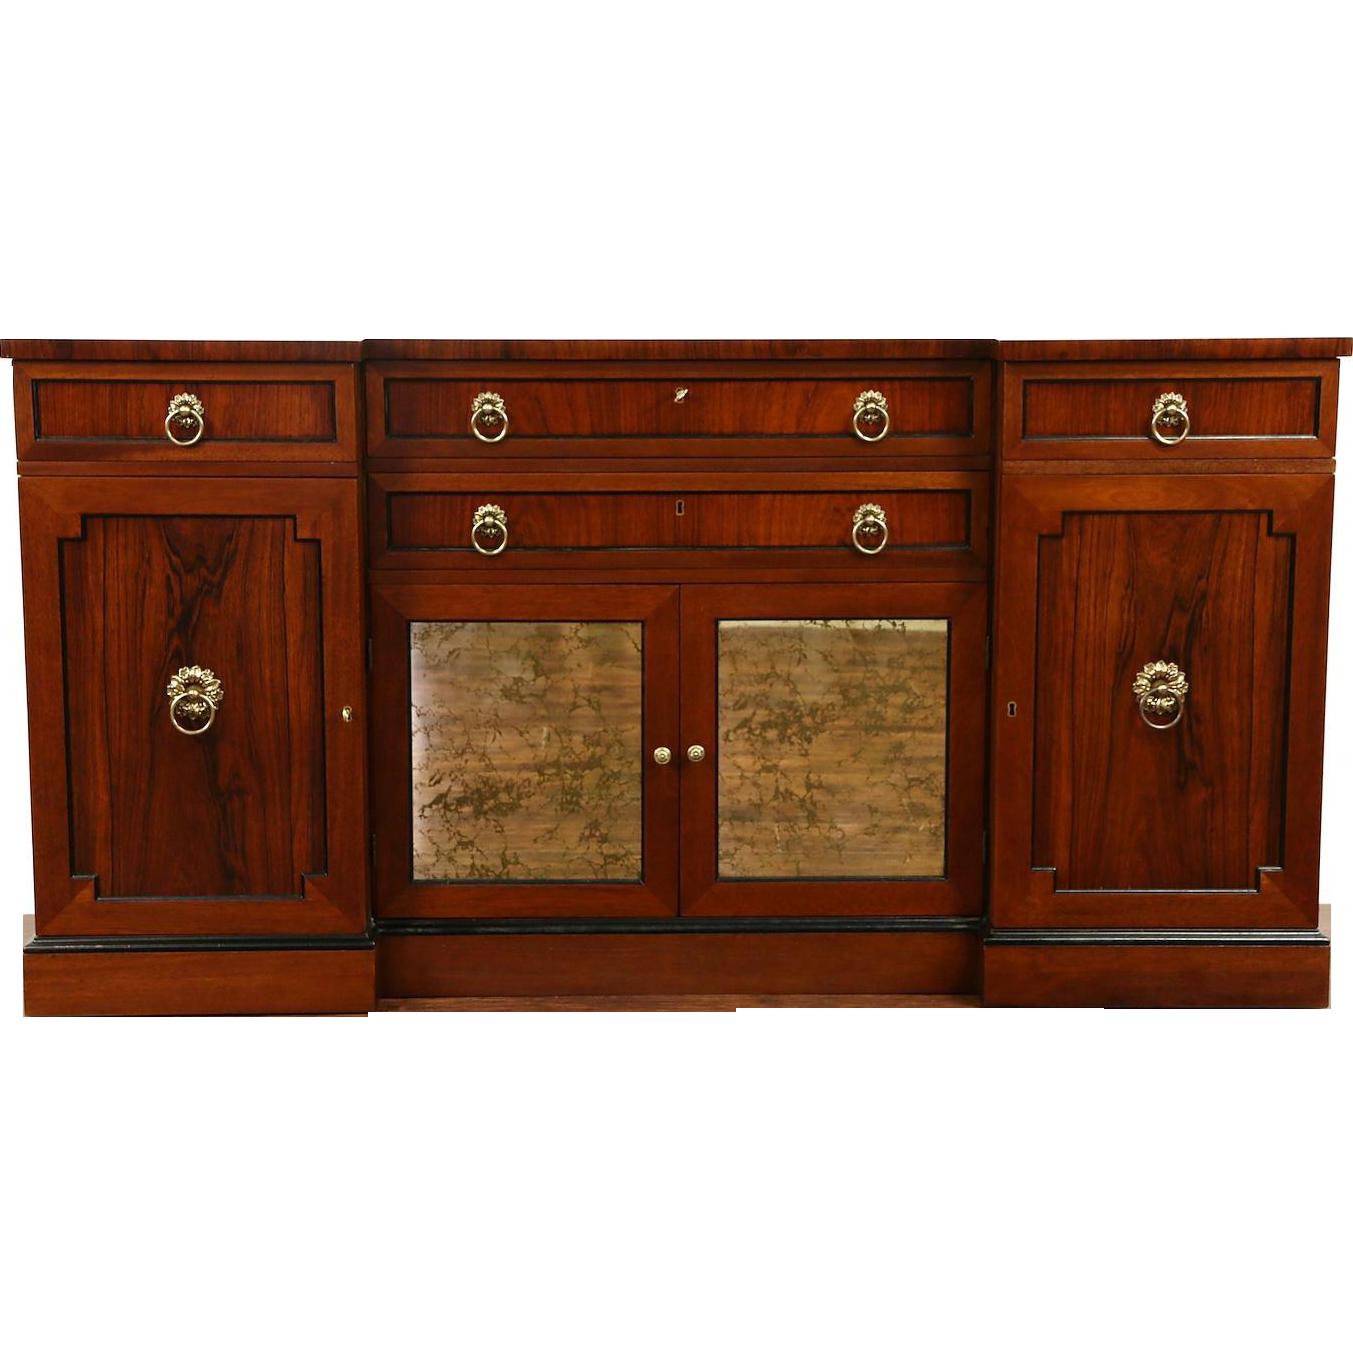 Kittinger NY Signed Rosewood Vintage Sideboard Server or Console